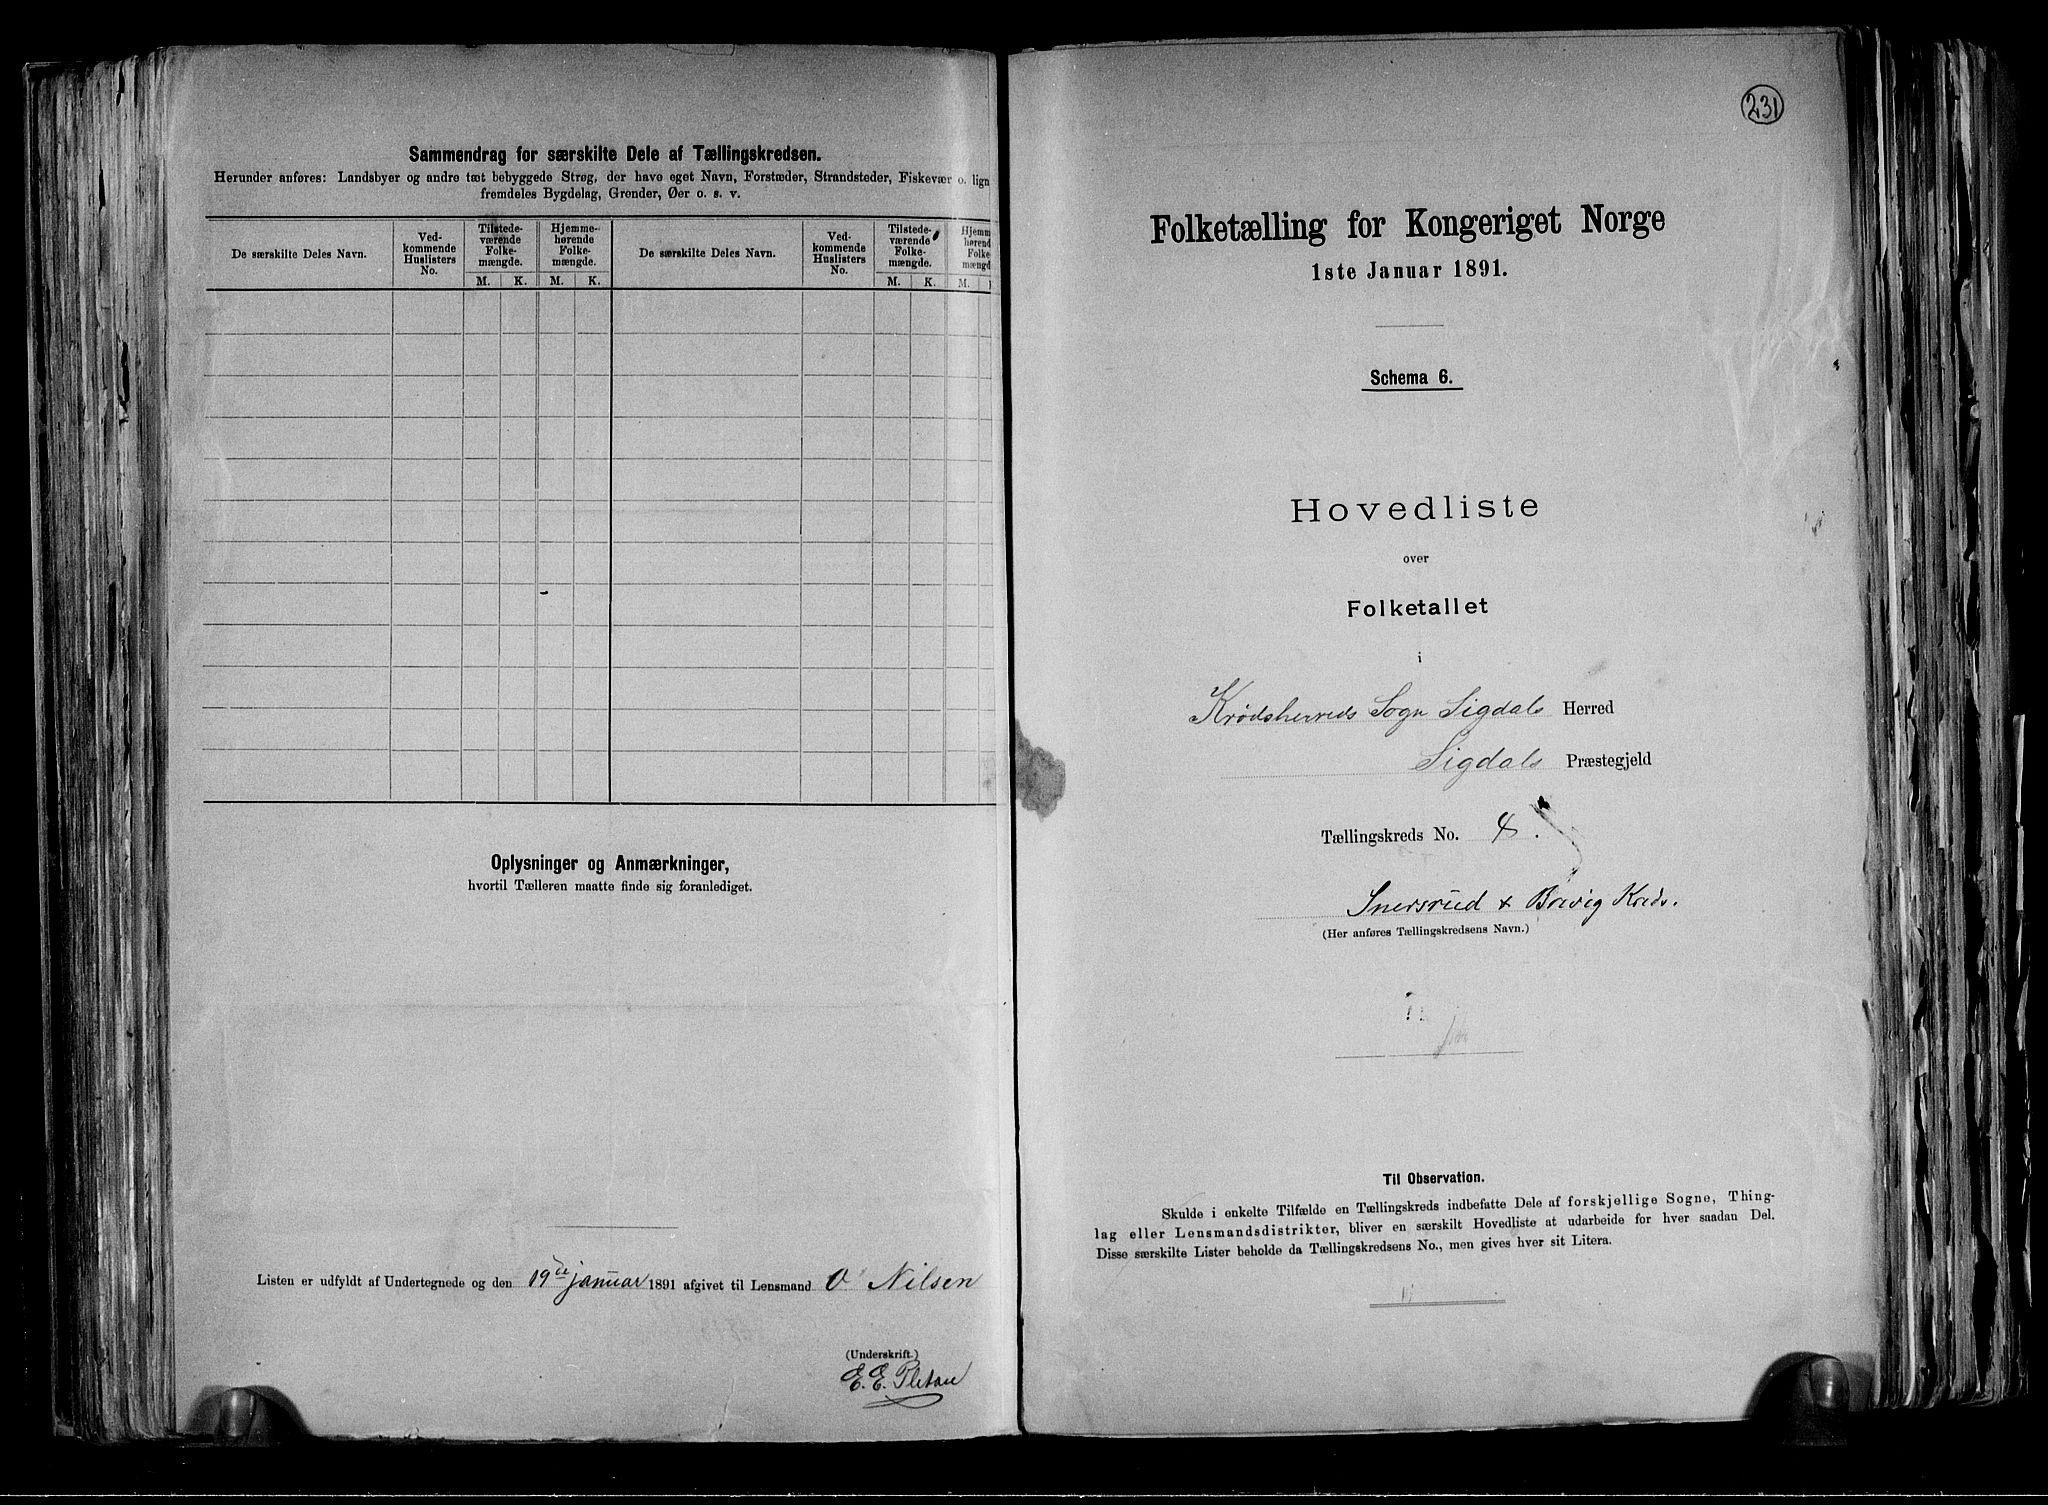 RA, Folketelling 1891 for 0621 Sigdal herred, 1891, s. 44